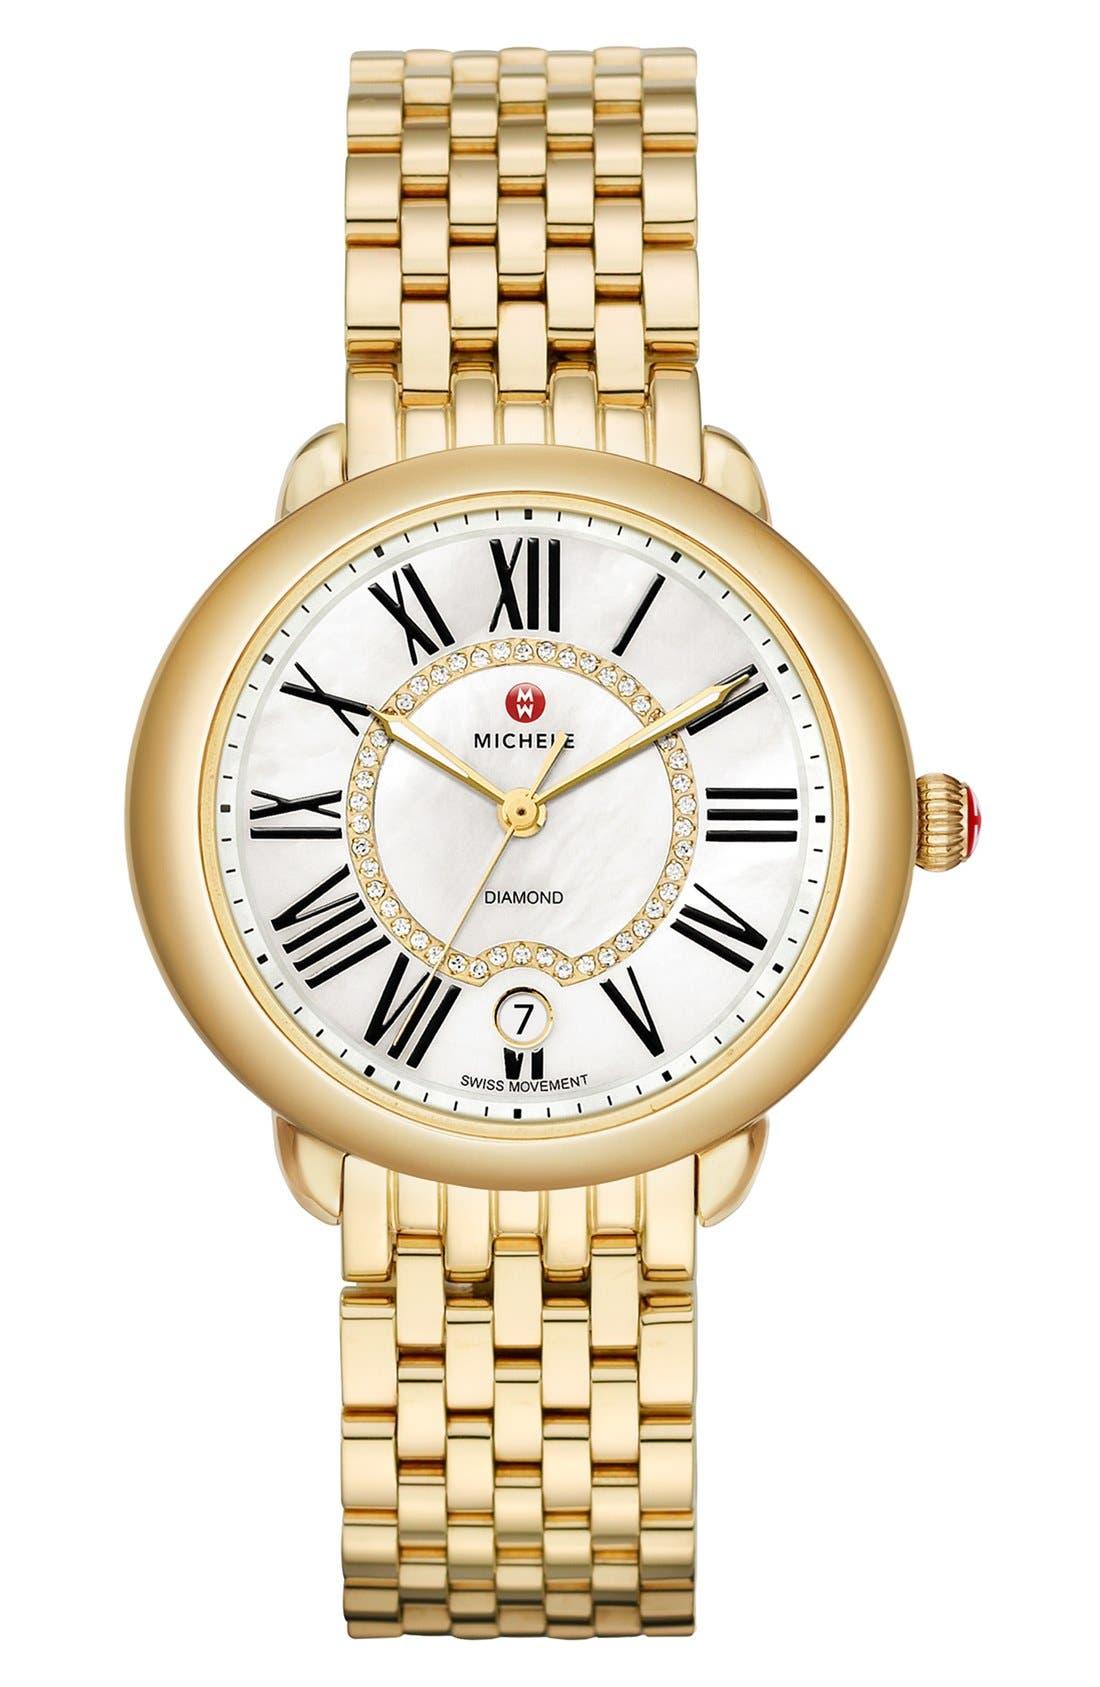 Serein 16mm Gold Plated Bracelet Watchband,                             Alternate thumbnail 3, color,                             GOLD